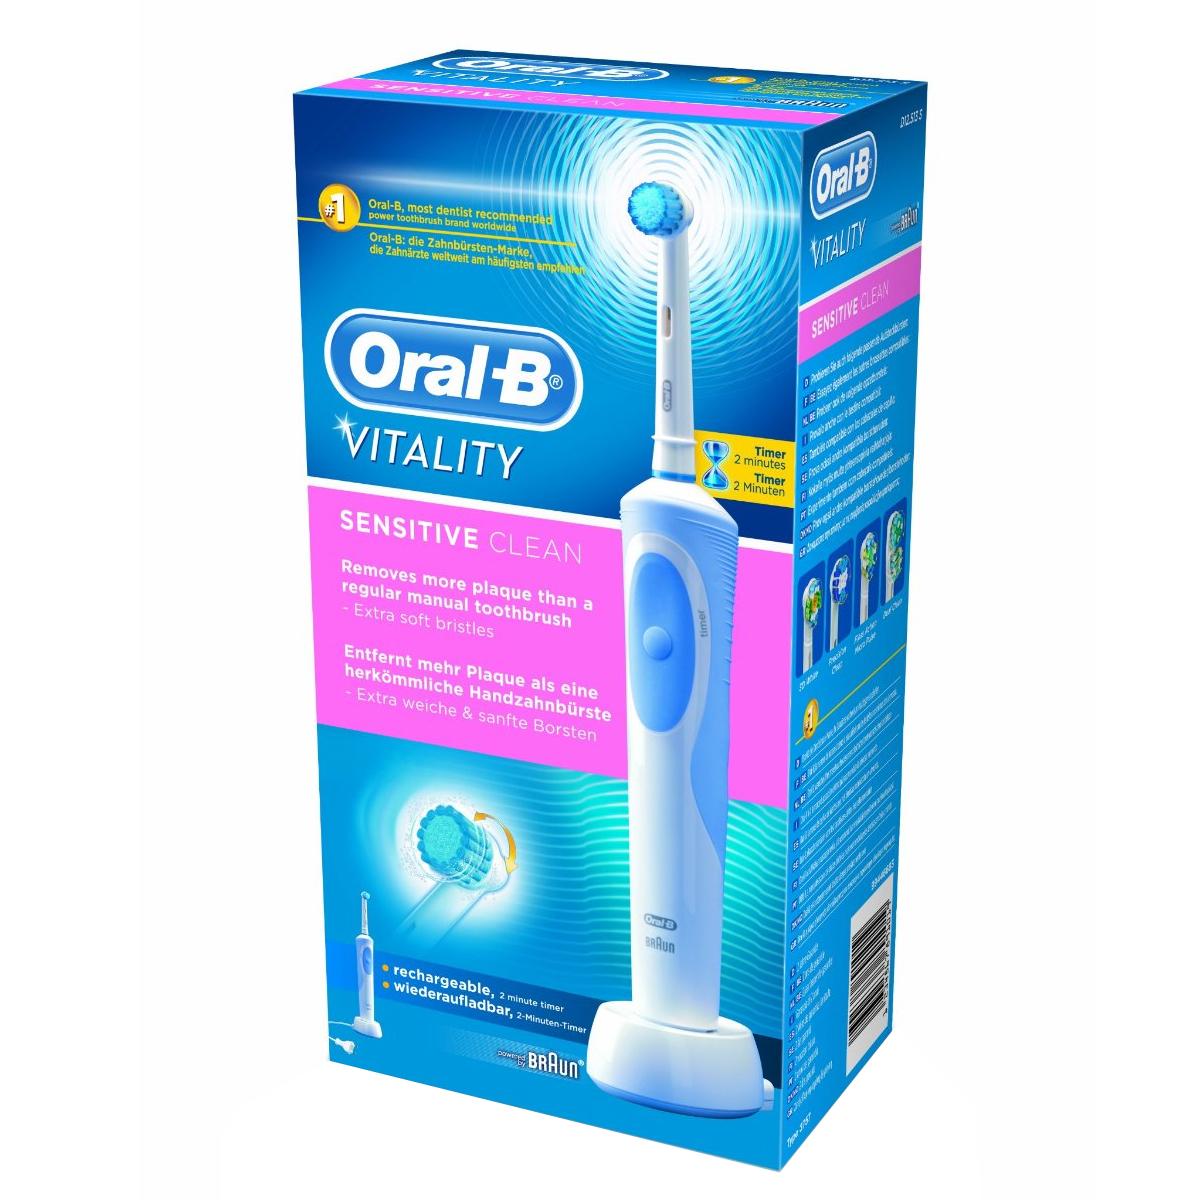 braun oral b vitality sensitive clean wiederaufladbare. Black Bedroom Furniture Sets. Home Design Ideas